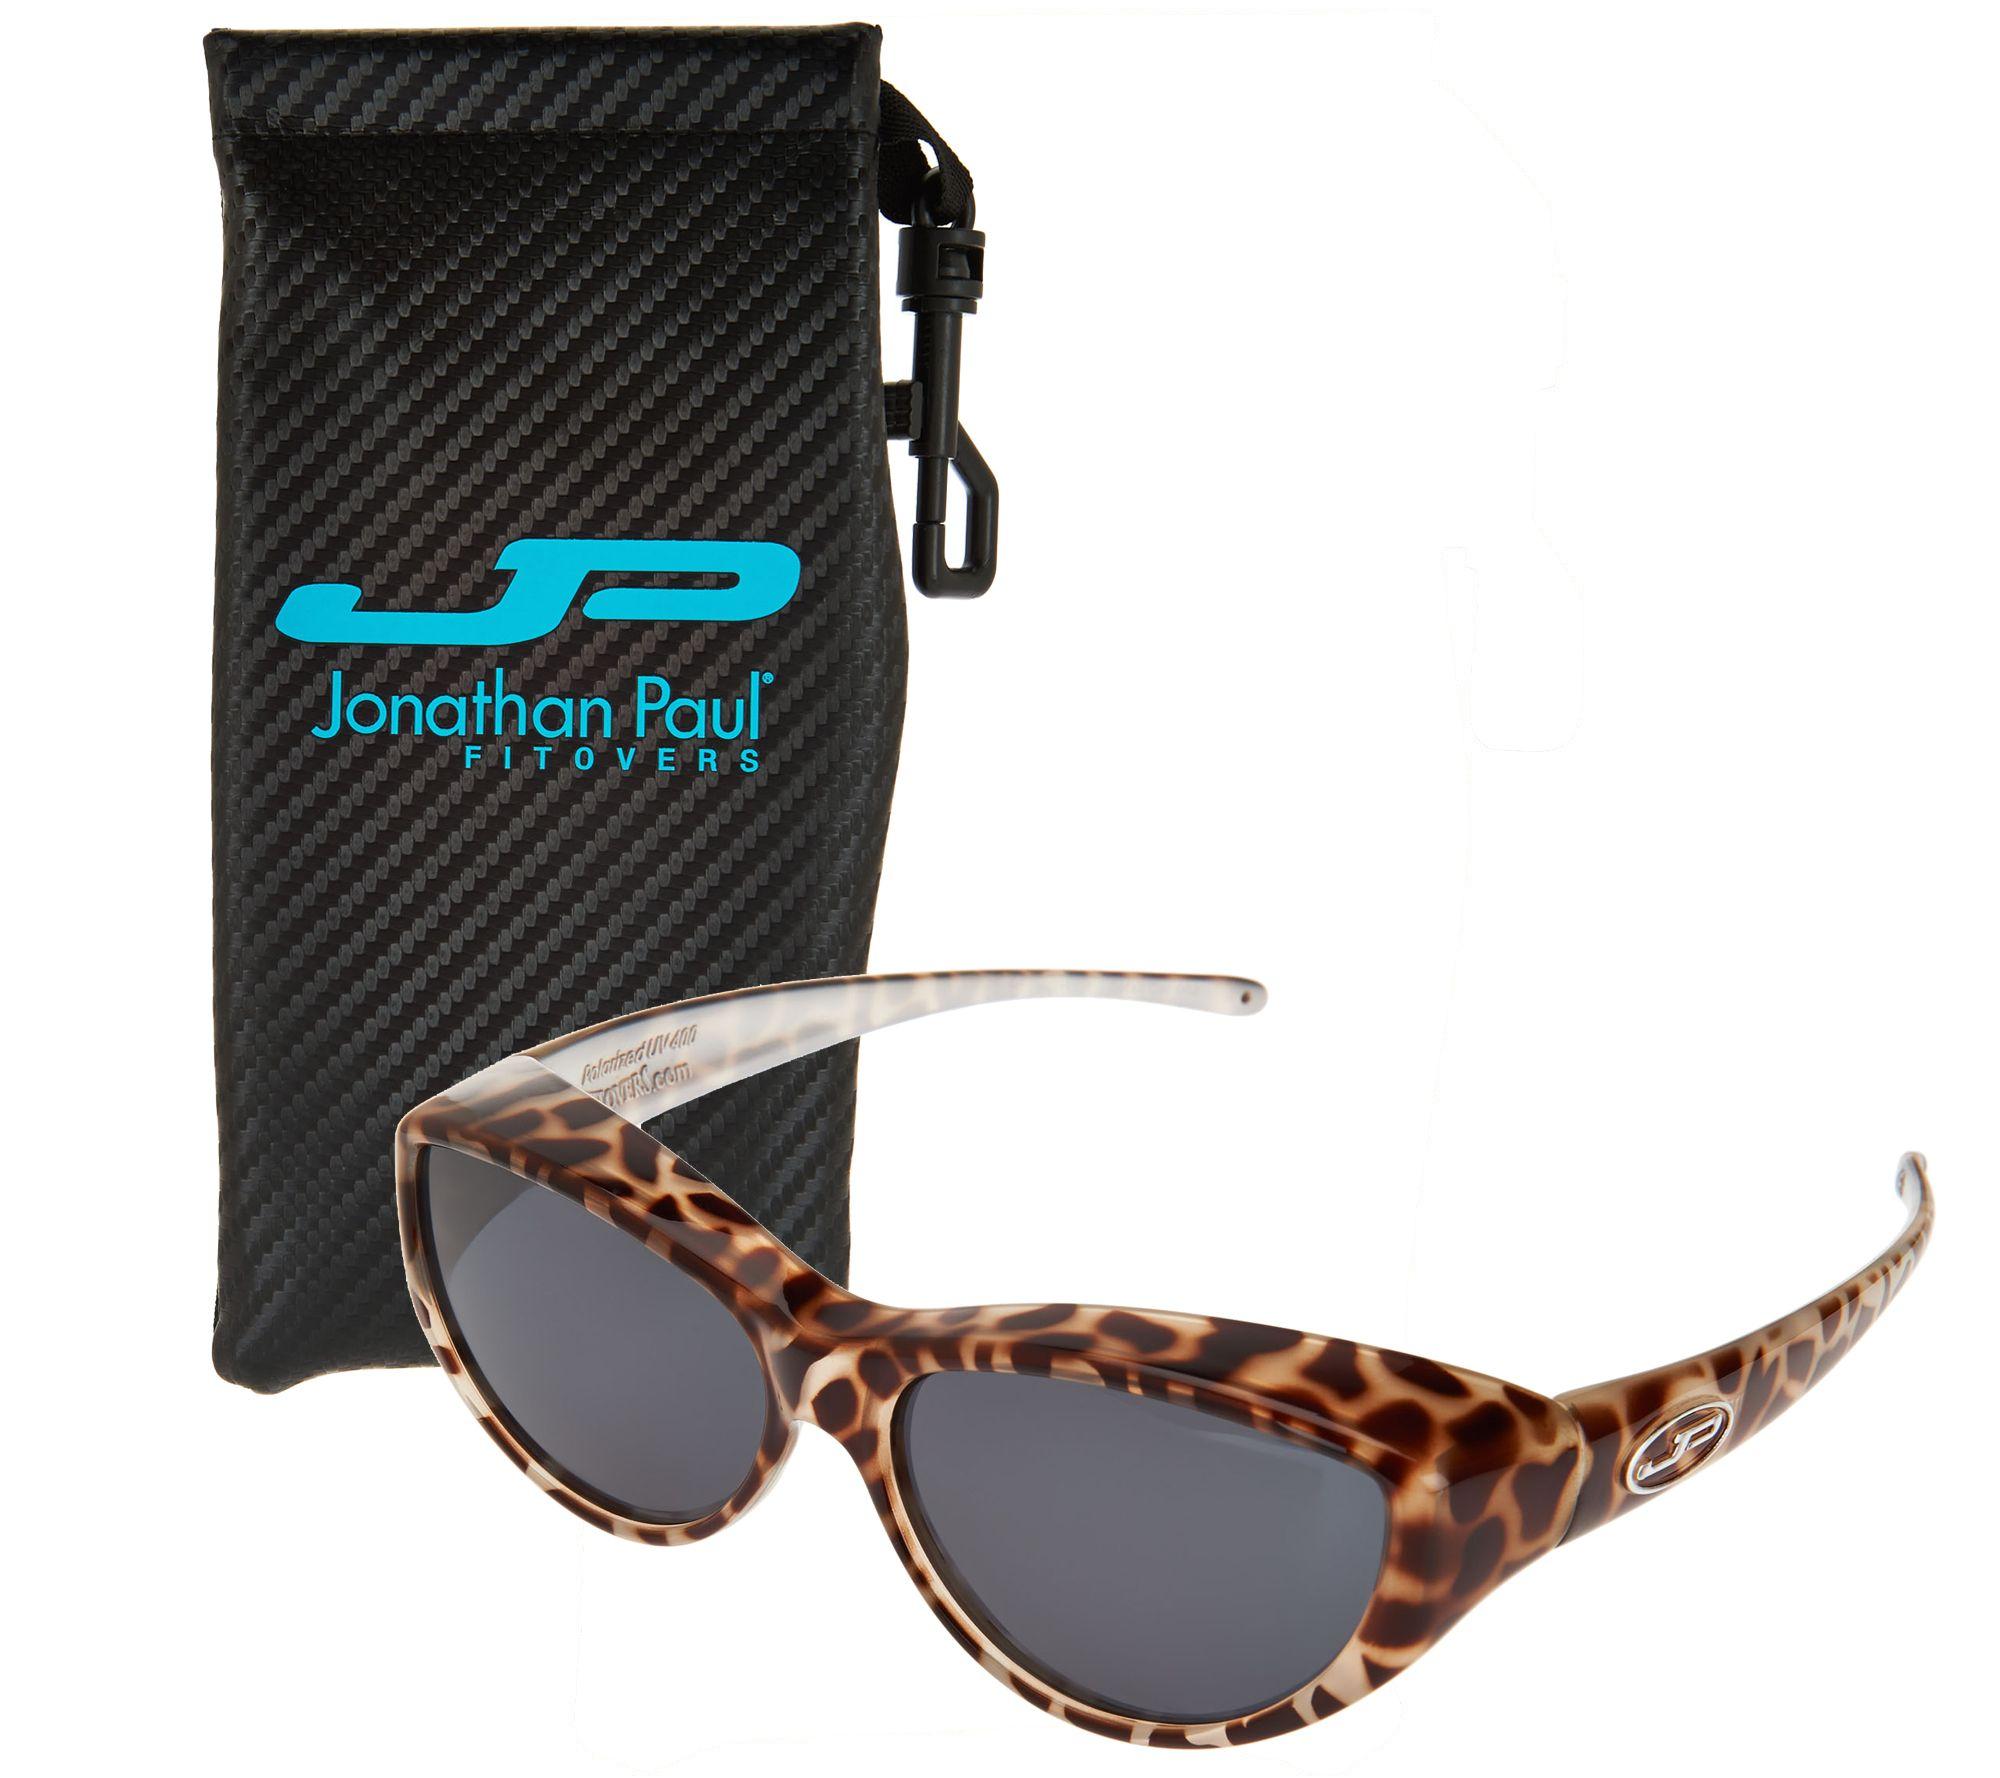 2b1021f72e Jonathan Paul Safari Cat Fitover Sunglasses with Case - Page 1 —  www.cinemas93.